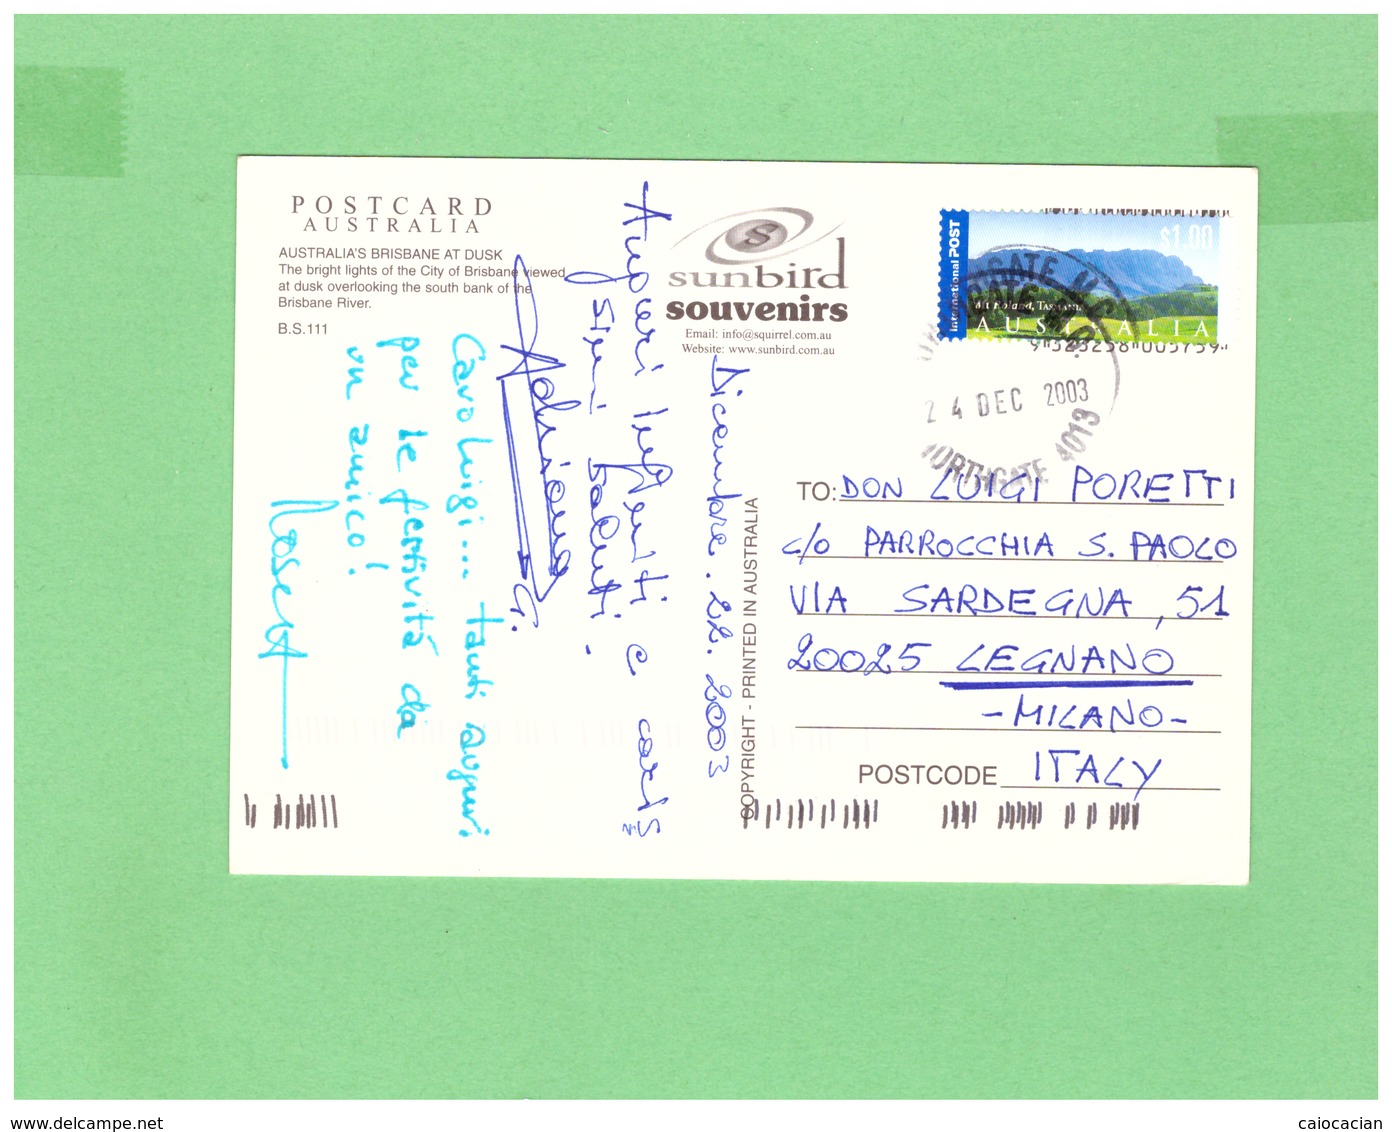 2003 AUSTRALIA BRISBANE AIR MAIL POSTCARD WITH 1 STAMP TO ITALY - 2000-09 Elizabeth II